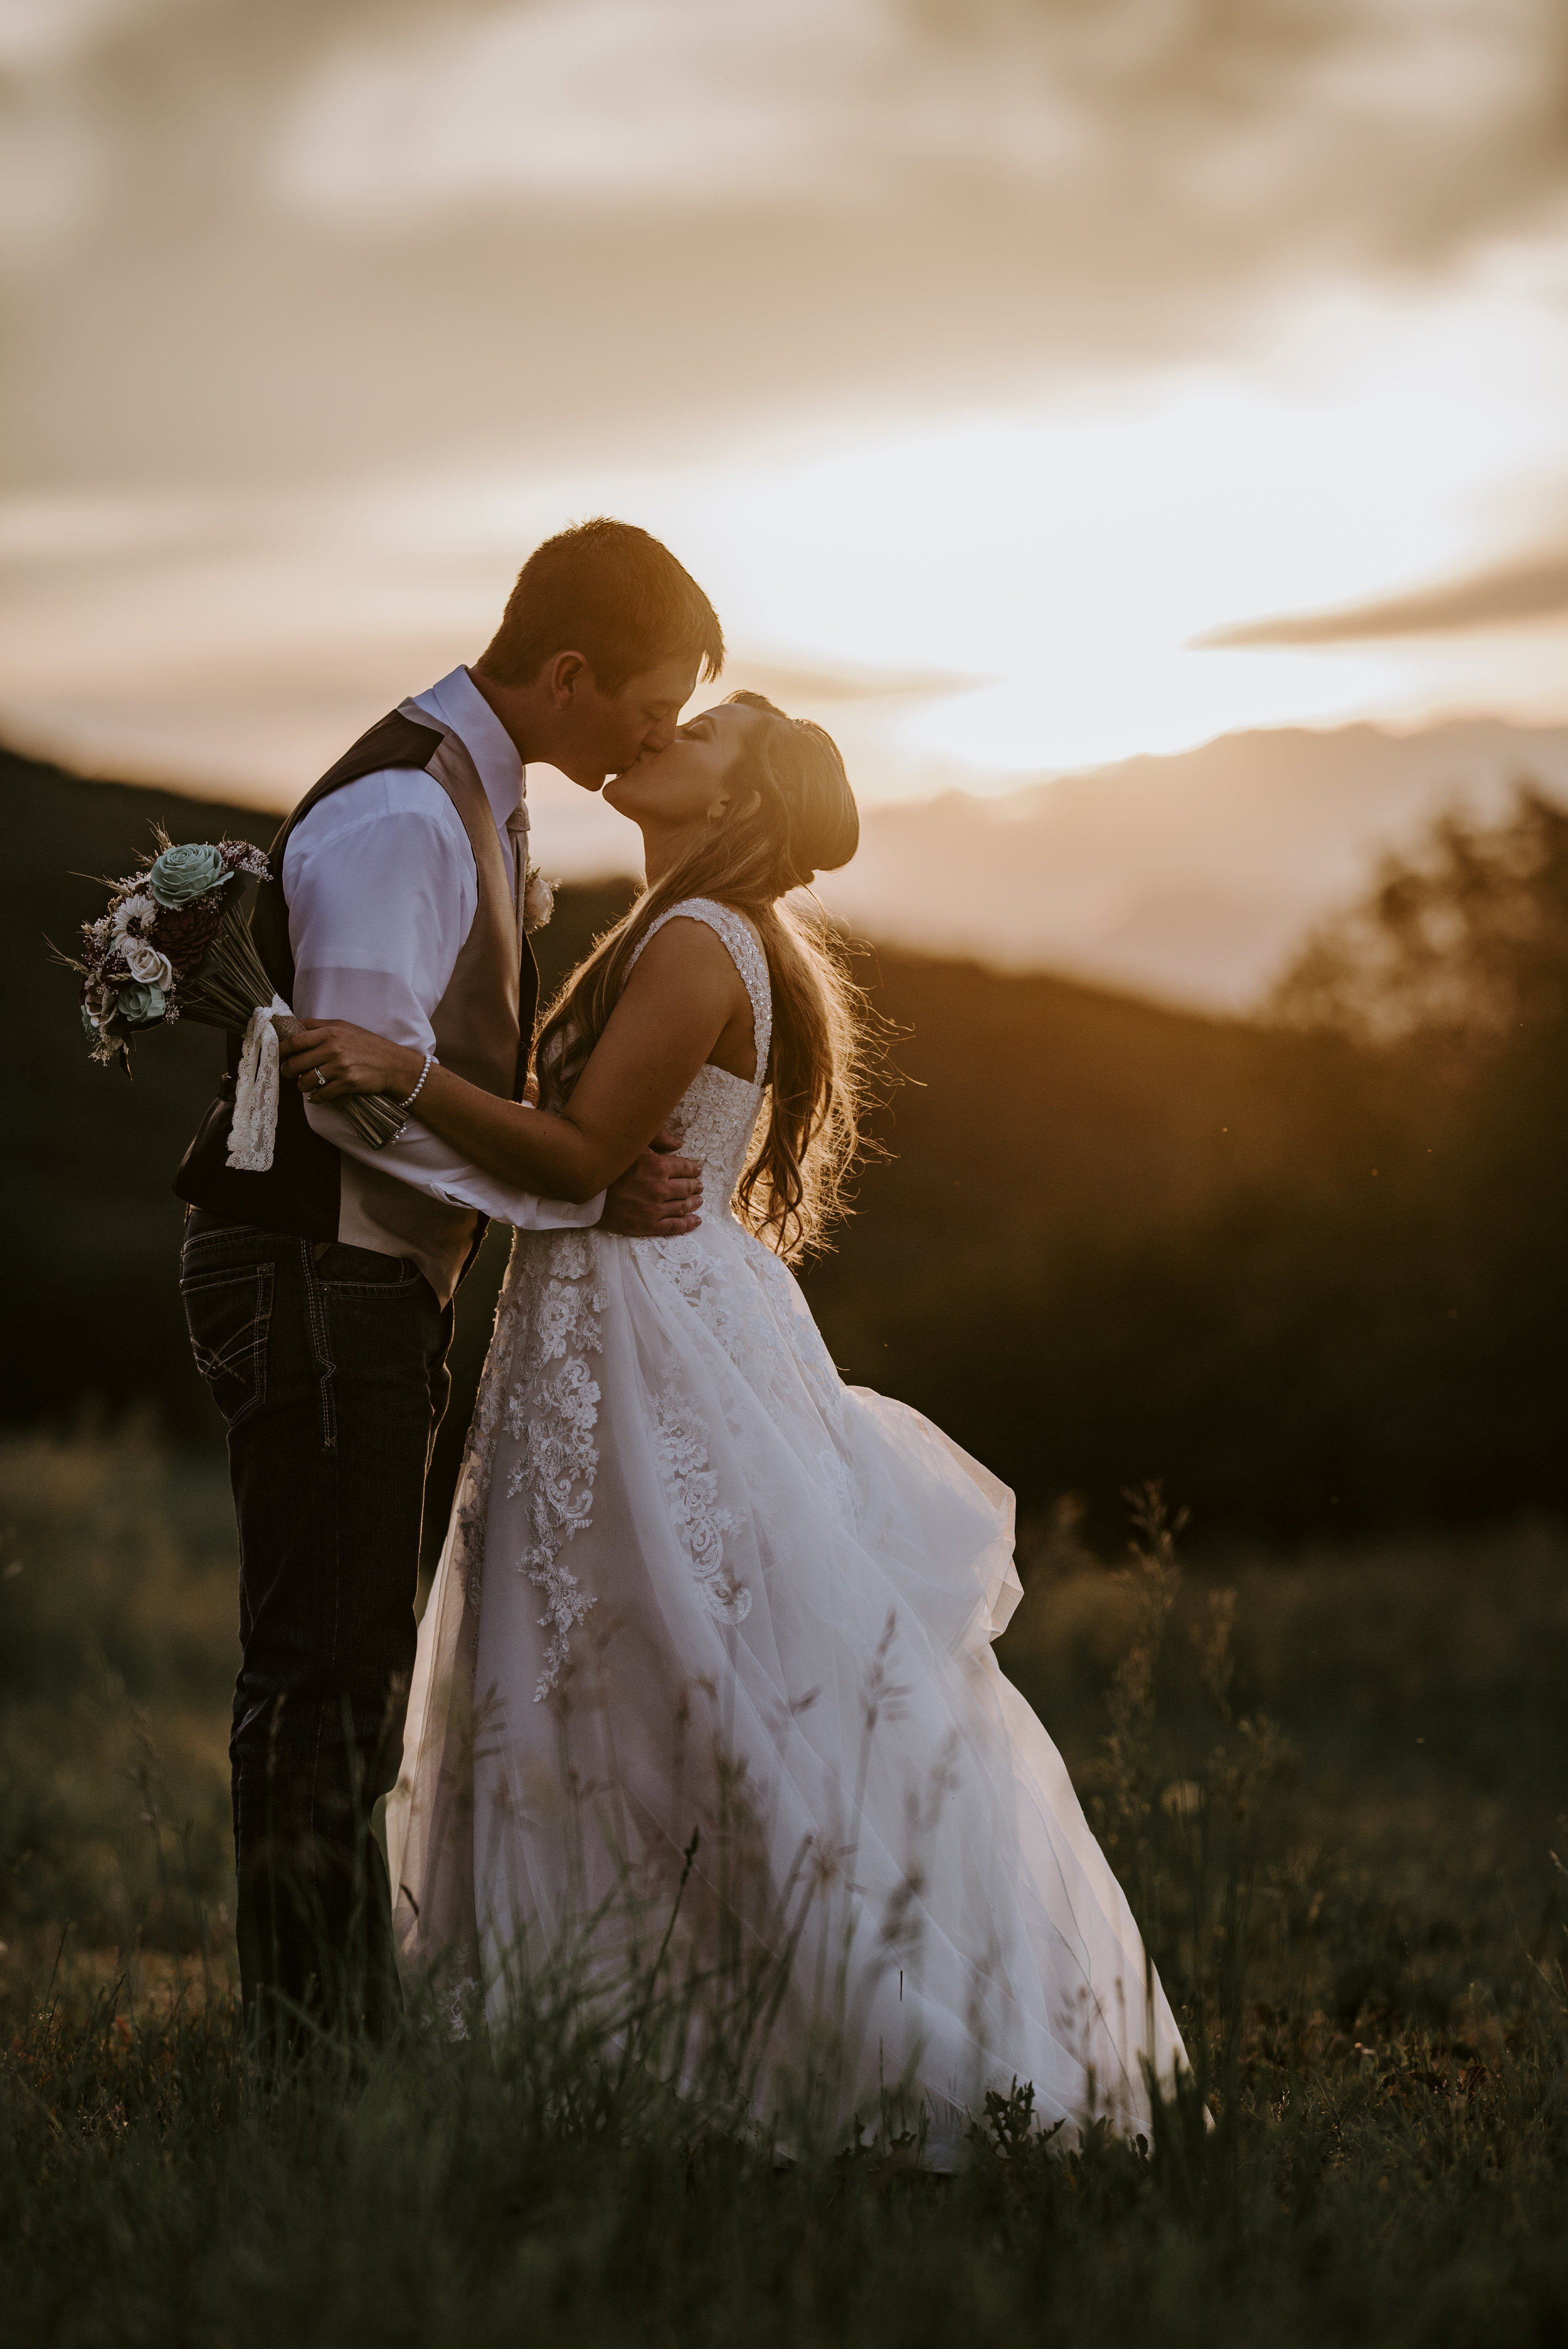 Breelle Hilsenrath Photography Small Intimate Weddings Colorado